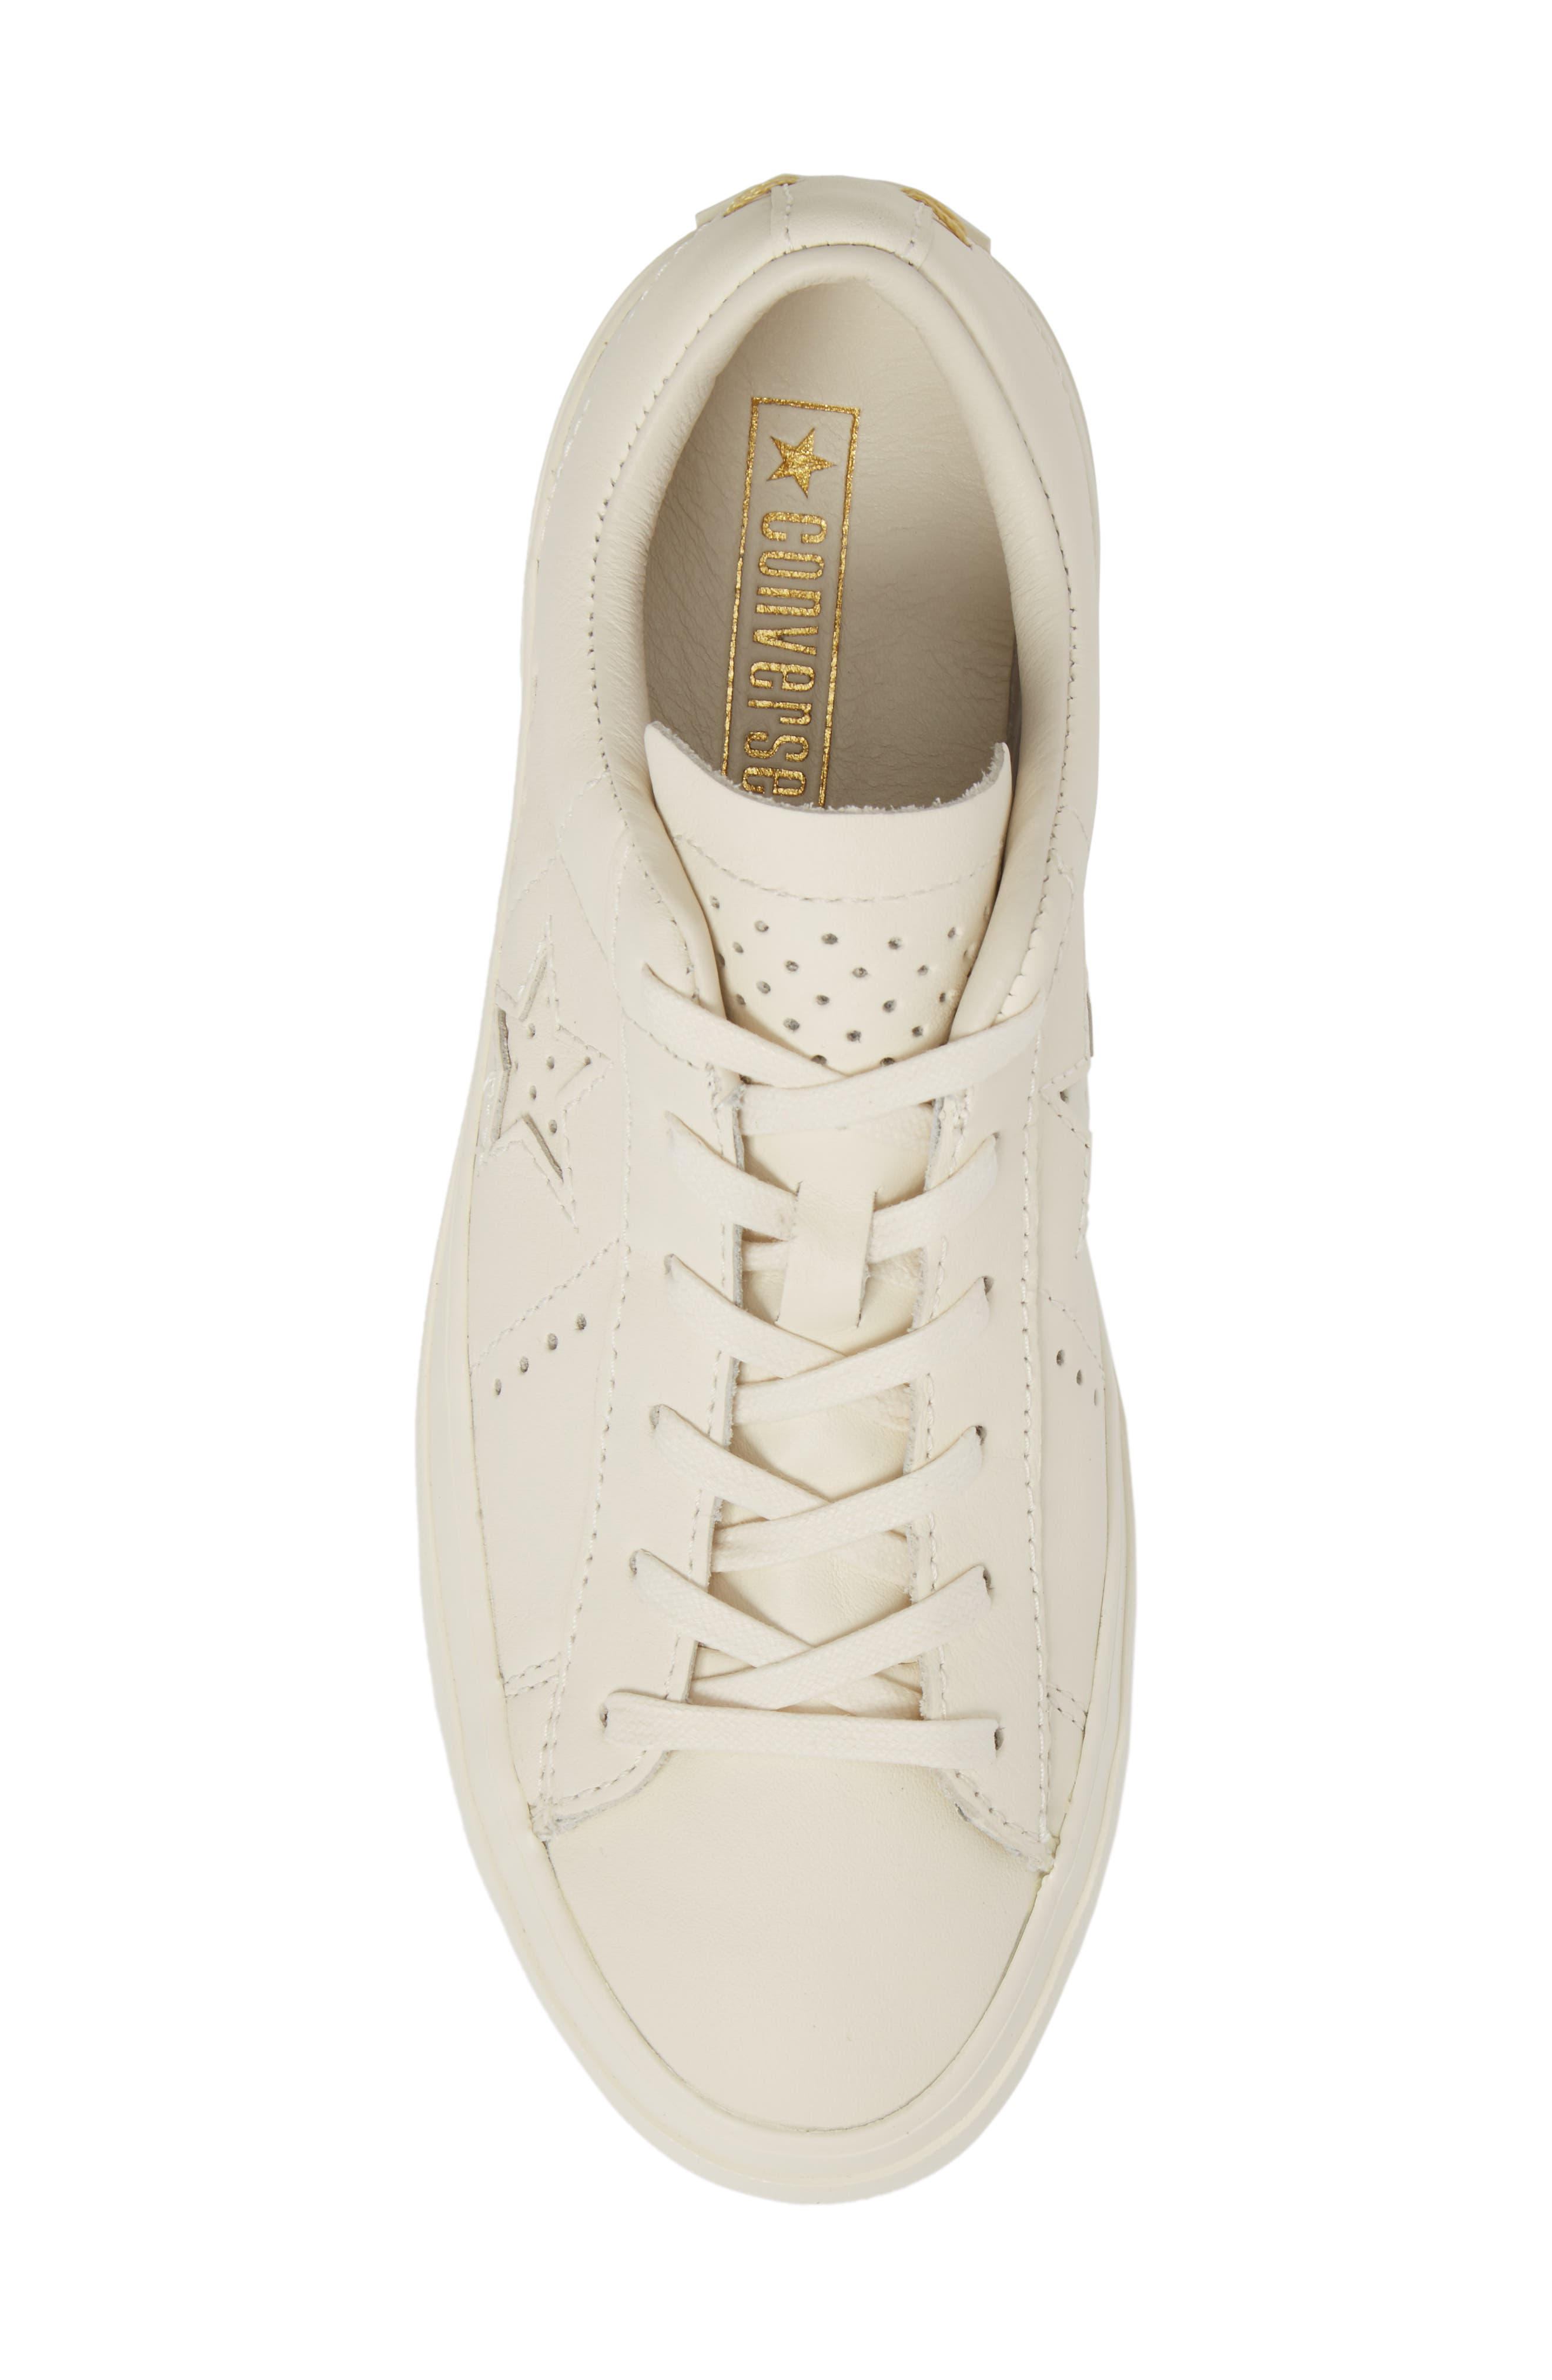 Chuck Taylor<sup>®</sup> All Star<sup>®</sup> One Star Platform Sneaker,                             Alternate thumbnail 5, color,                             Egret/ Egret